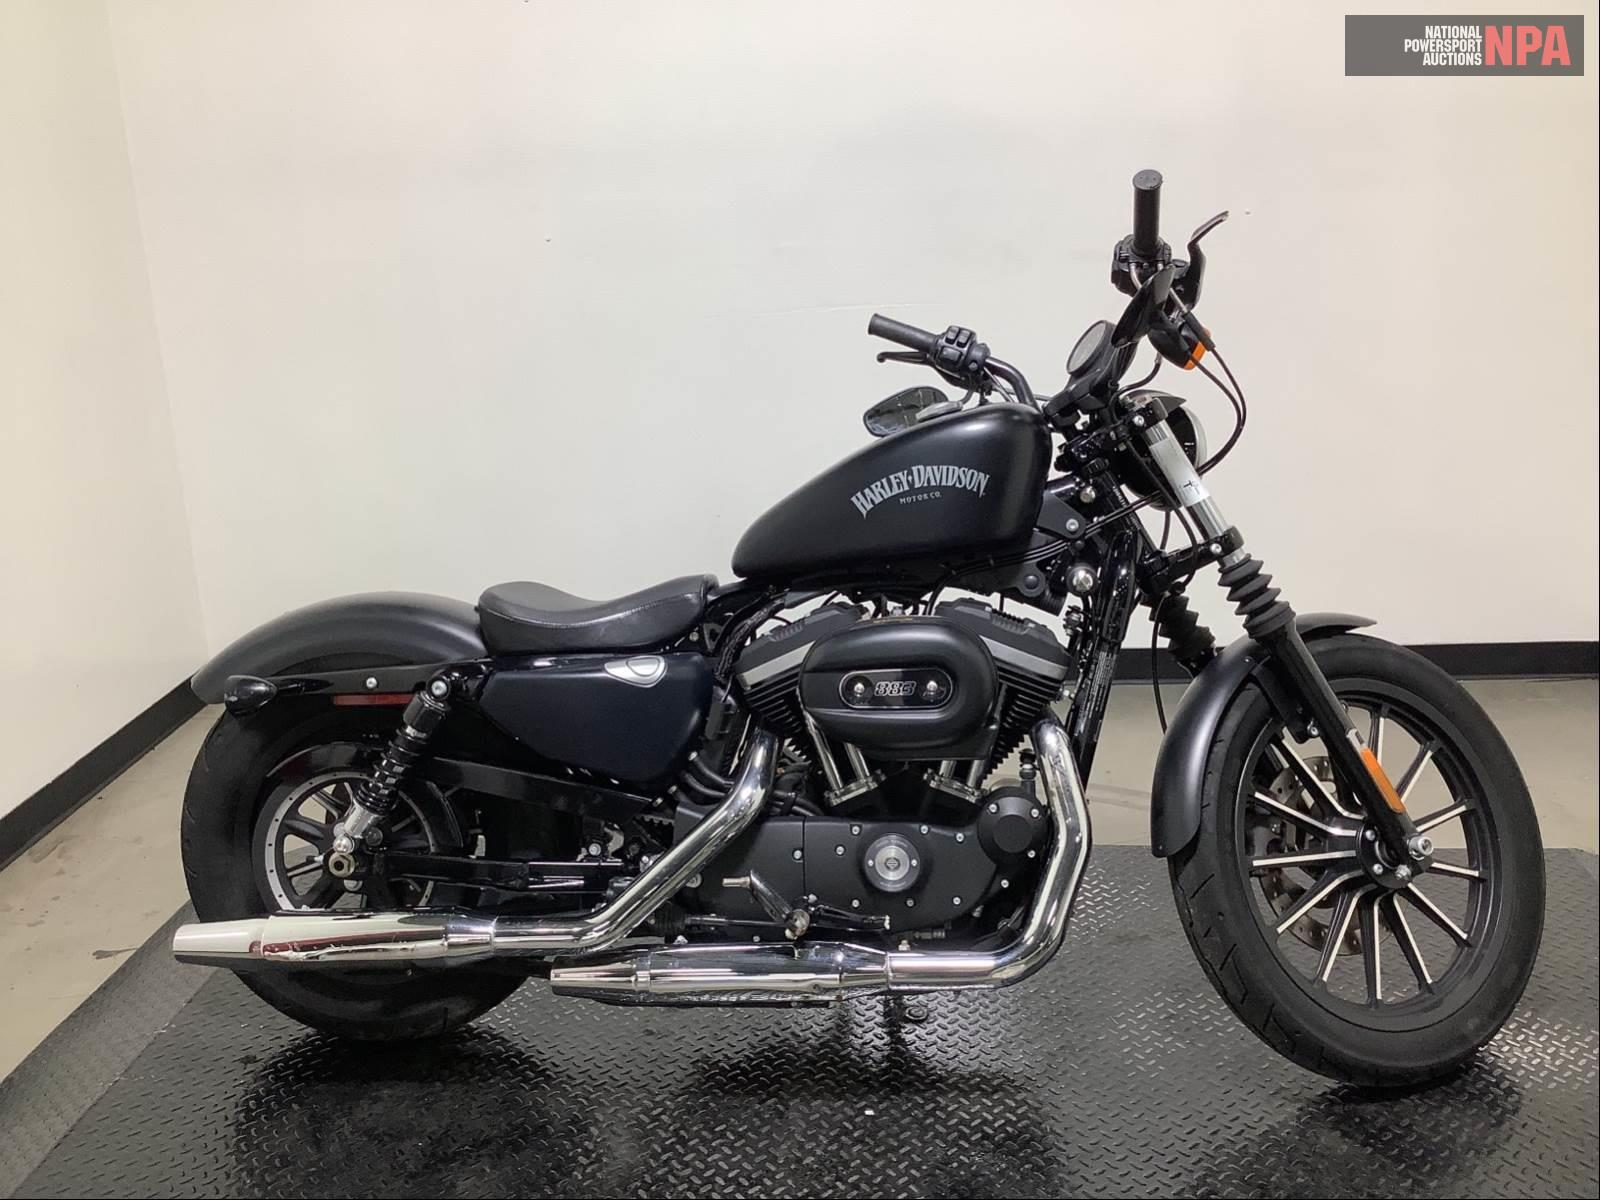 2014 Harley-Davidson Sportster XL883